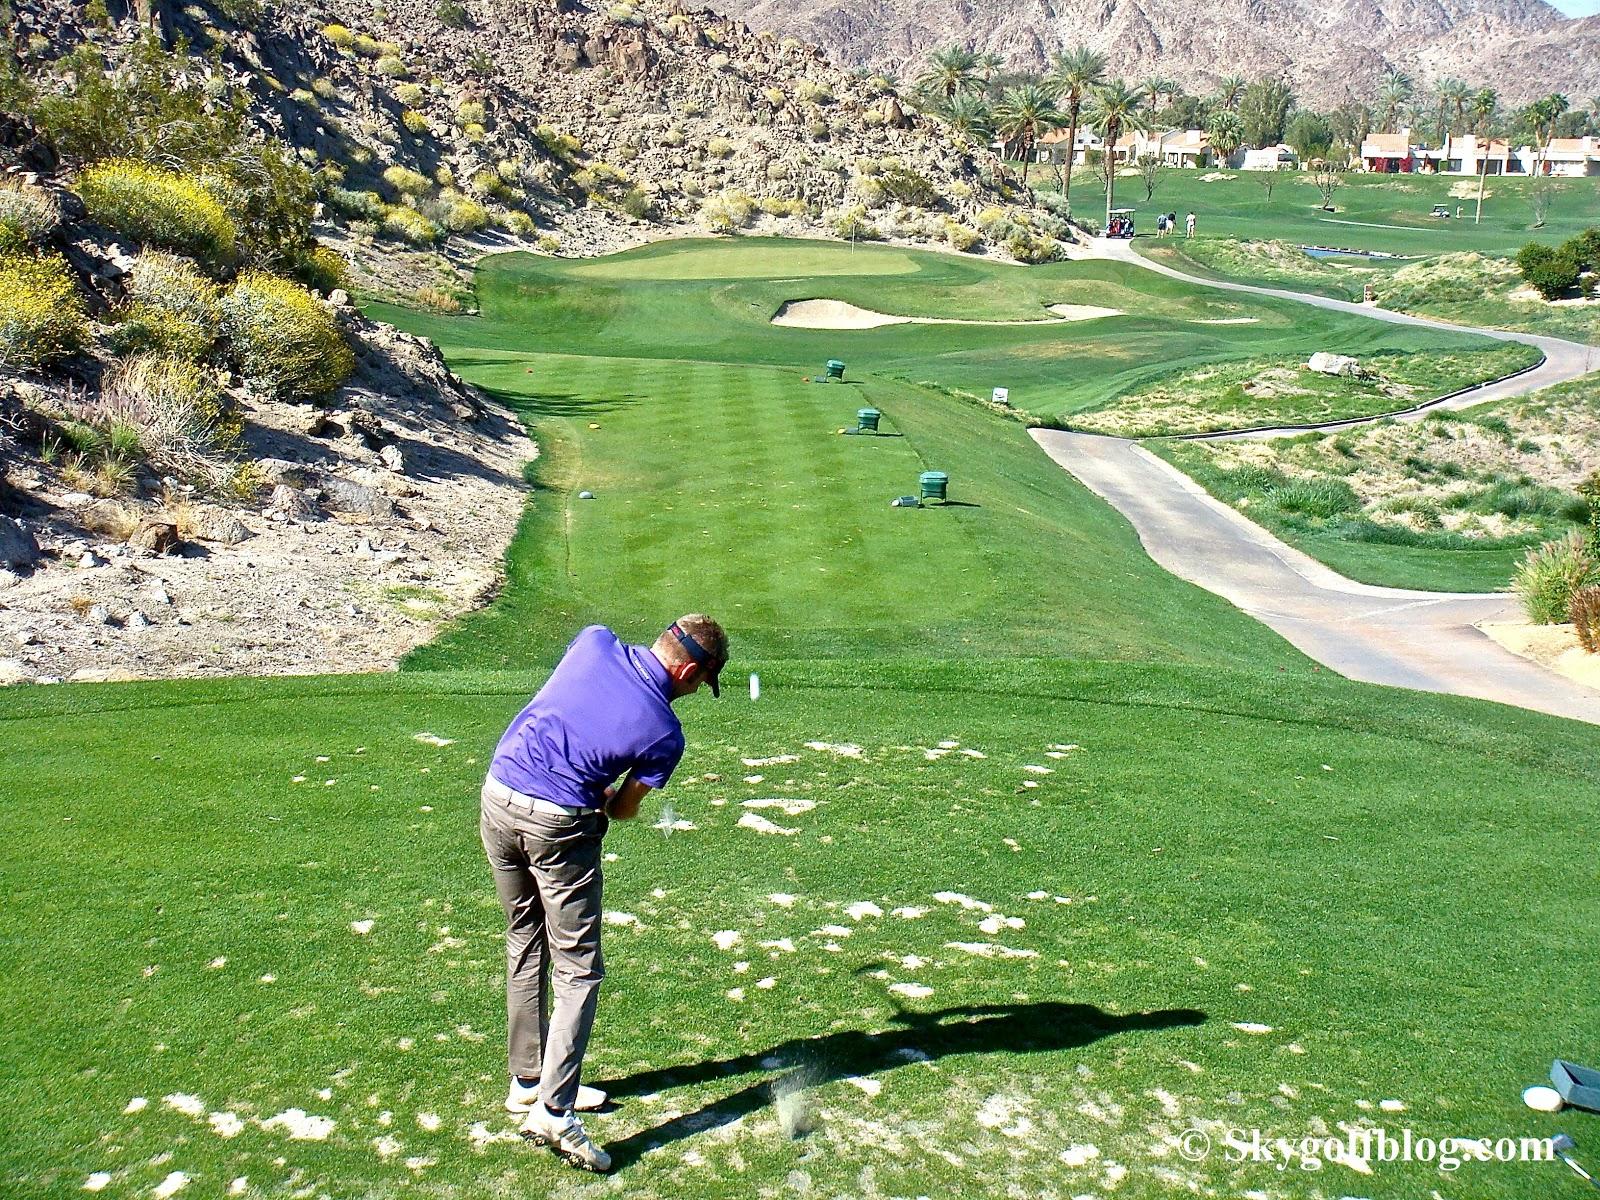 skygolf blog golf courses around the world: la quinta resort